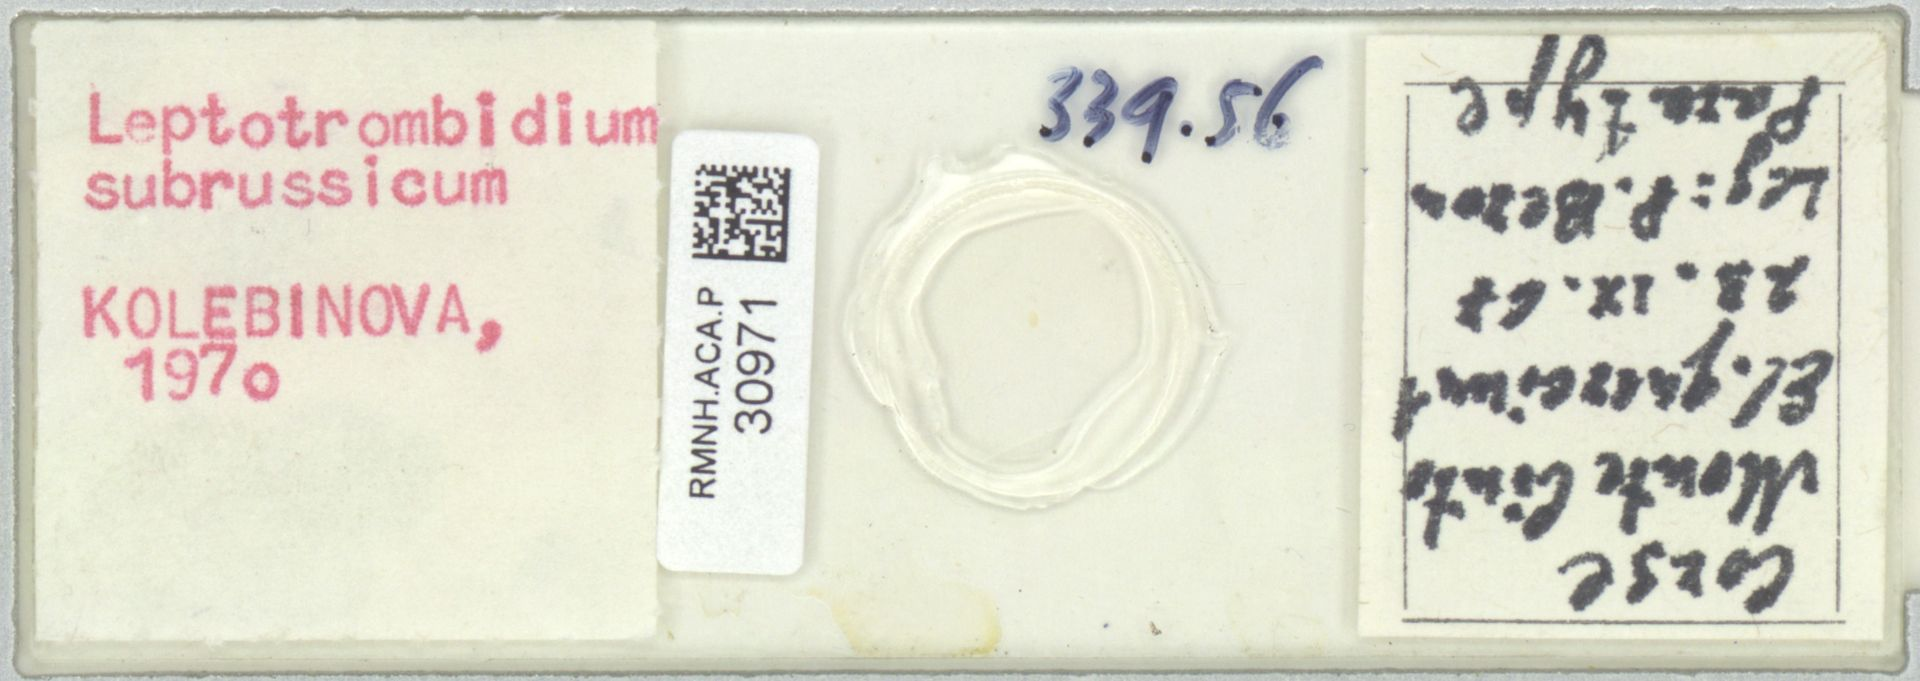 RMNH.ACA.P.30971 | Leptotrombidium subrussicum Kolebinova 1970